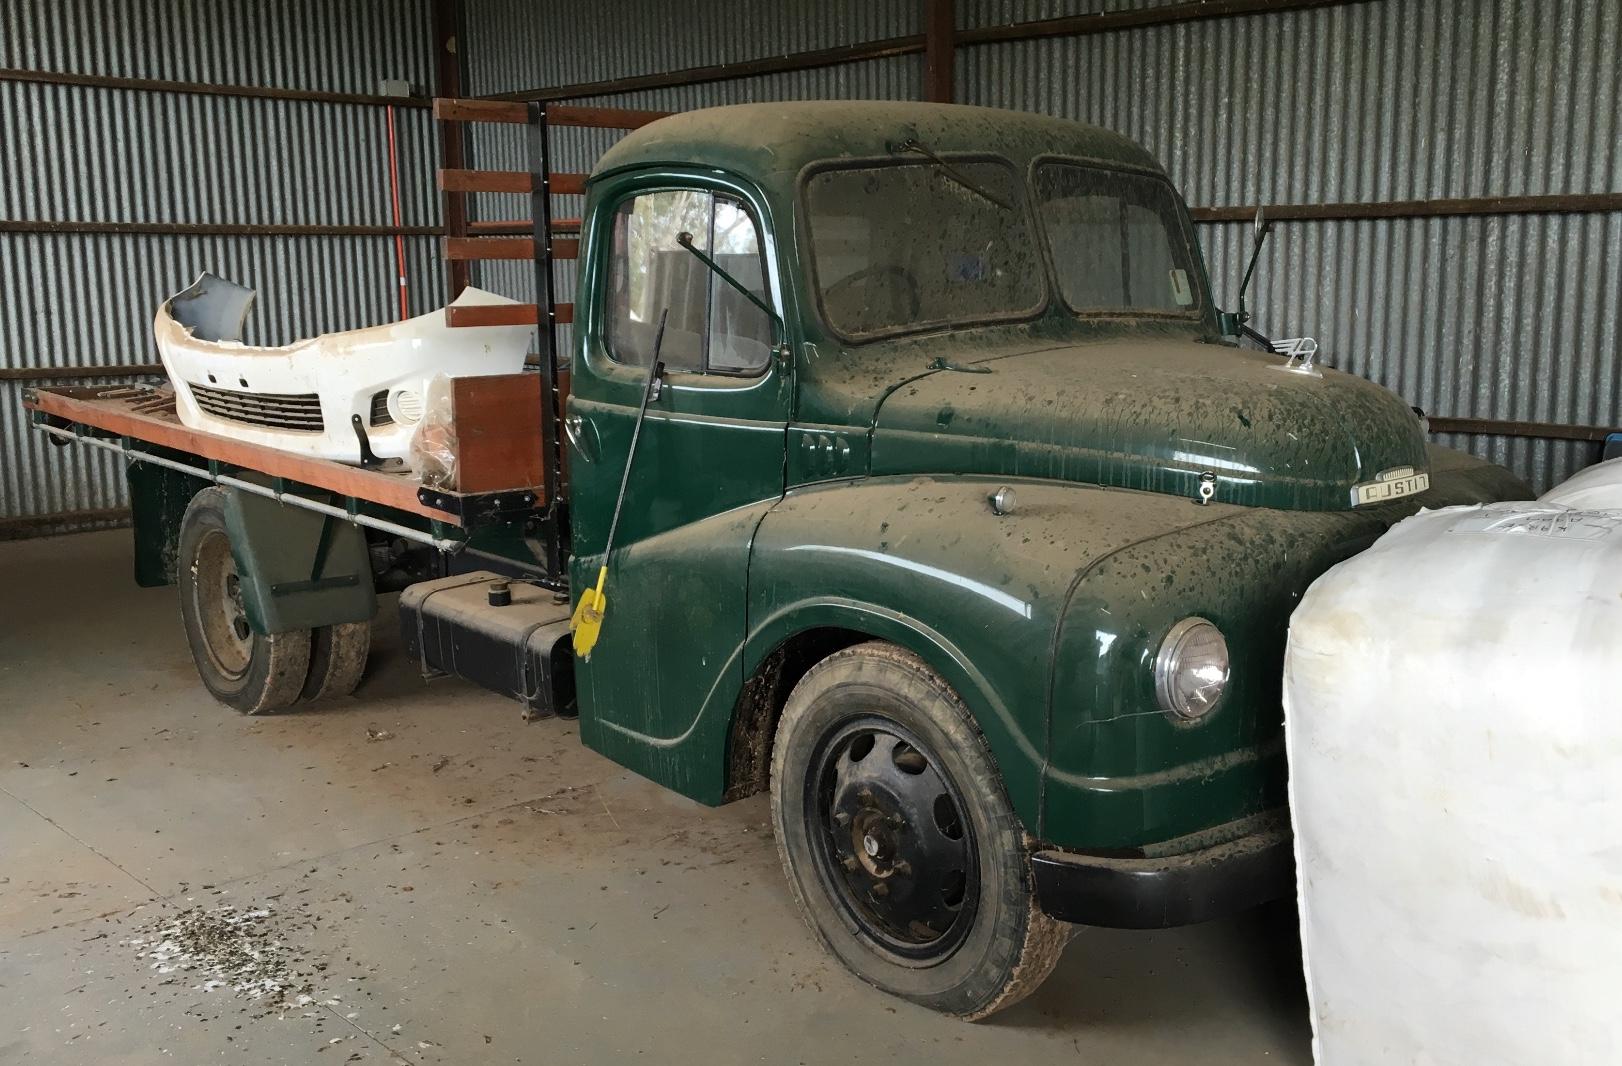 1952 austin truck for sale fully restored trucks farm tender. Black Bedroom Furniture Sets. Home Design Ideas